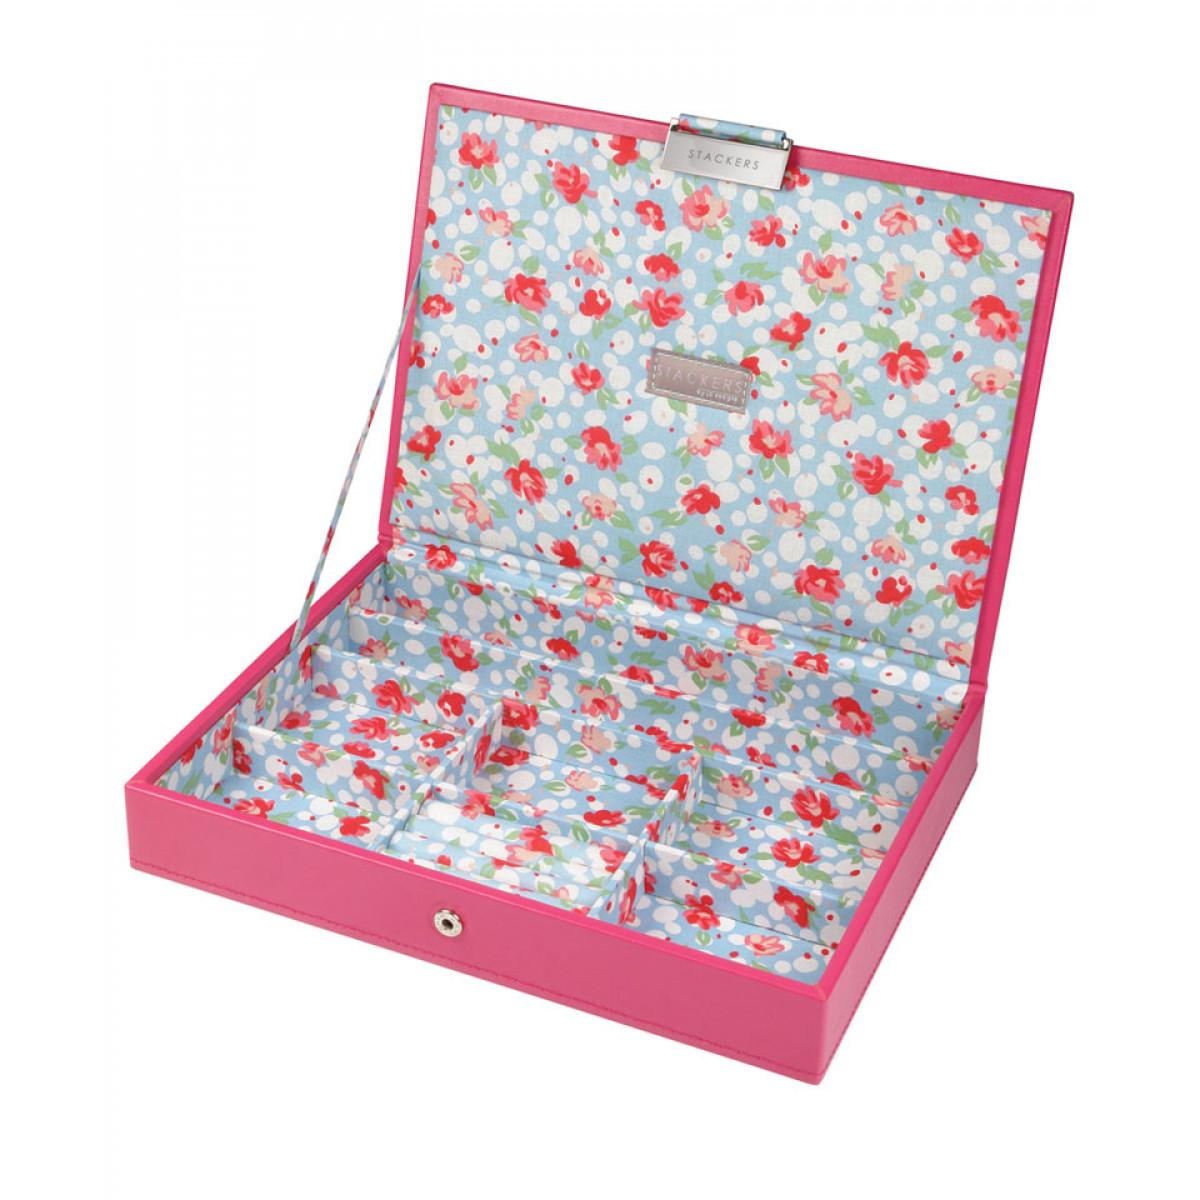 cutie bijuterii capac deschis